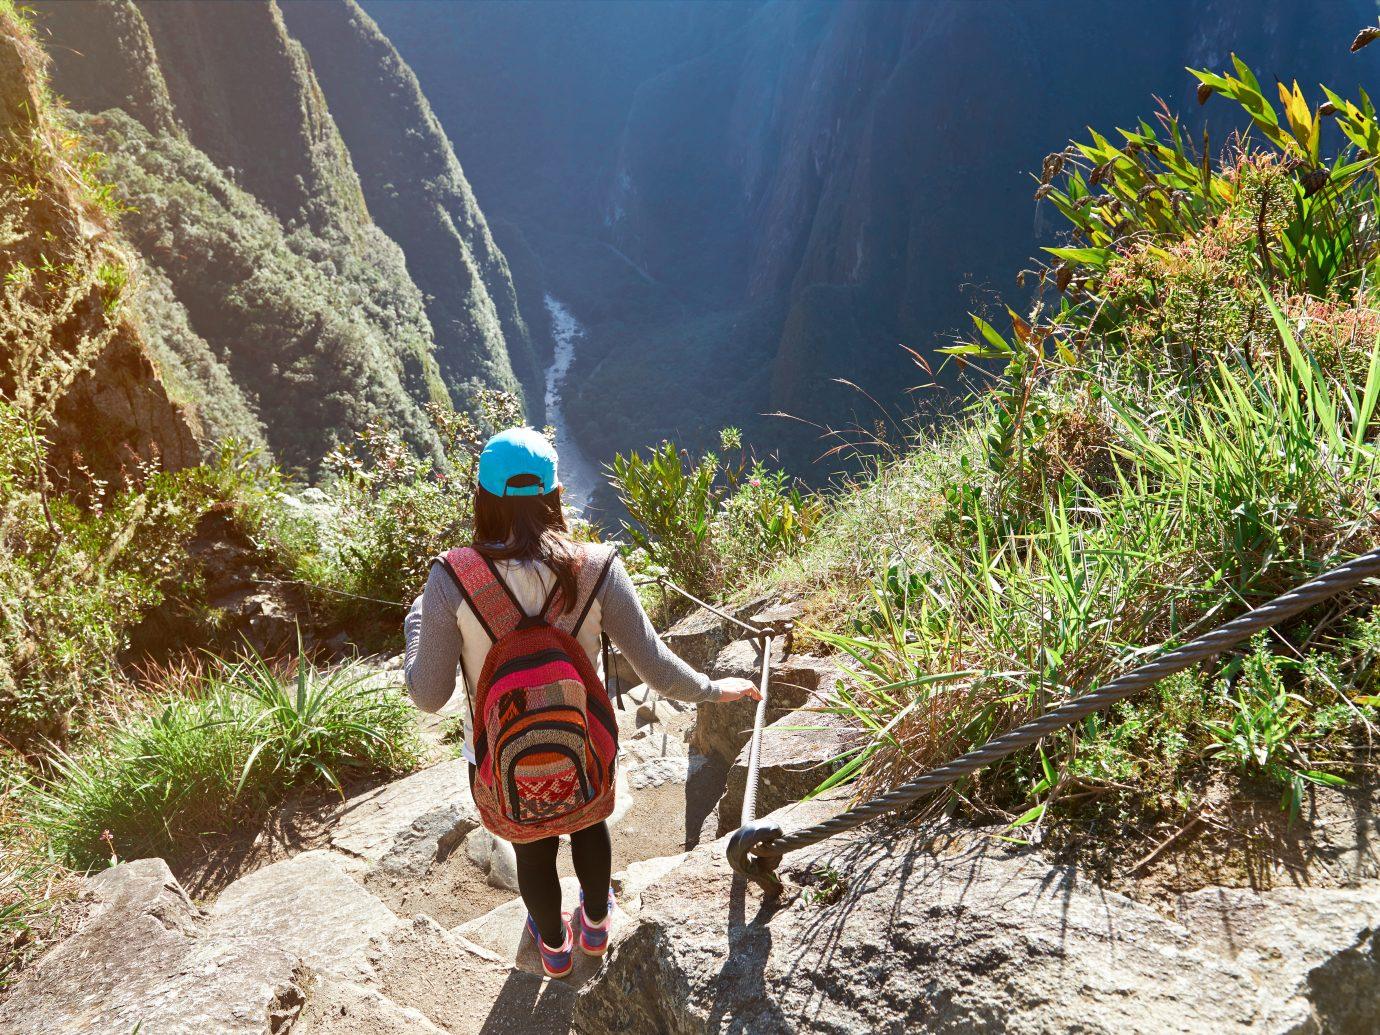 Woman in nature adventure walk in mountain landscape. Girl doing trekking in Machu Picchu path